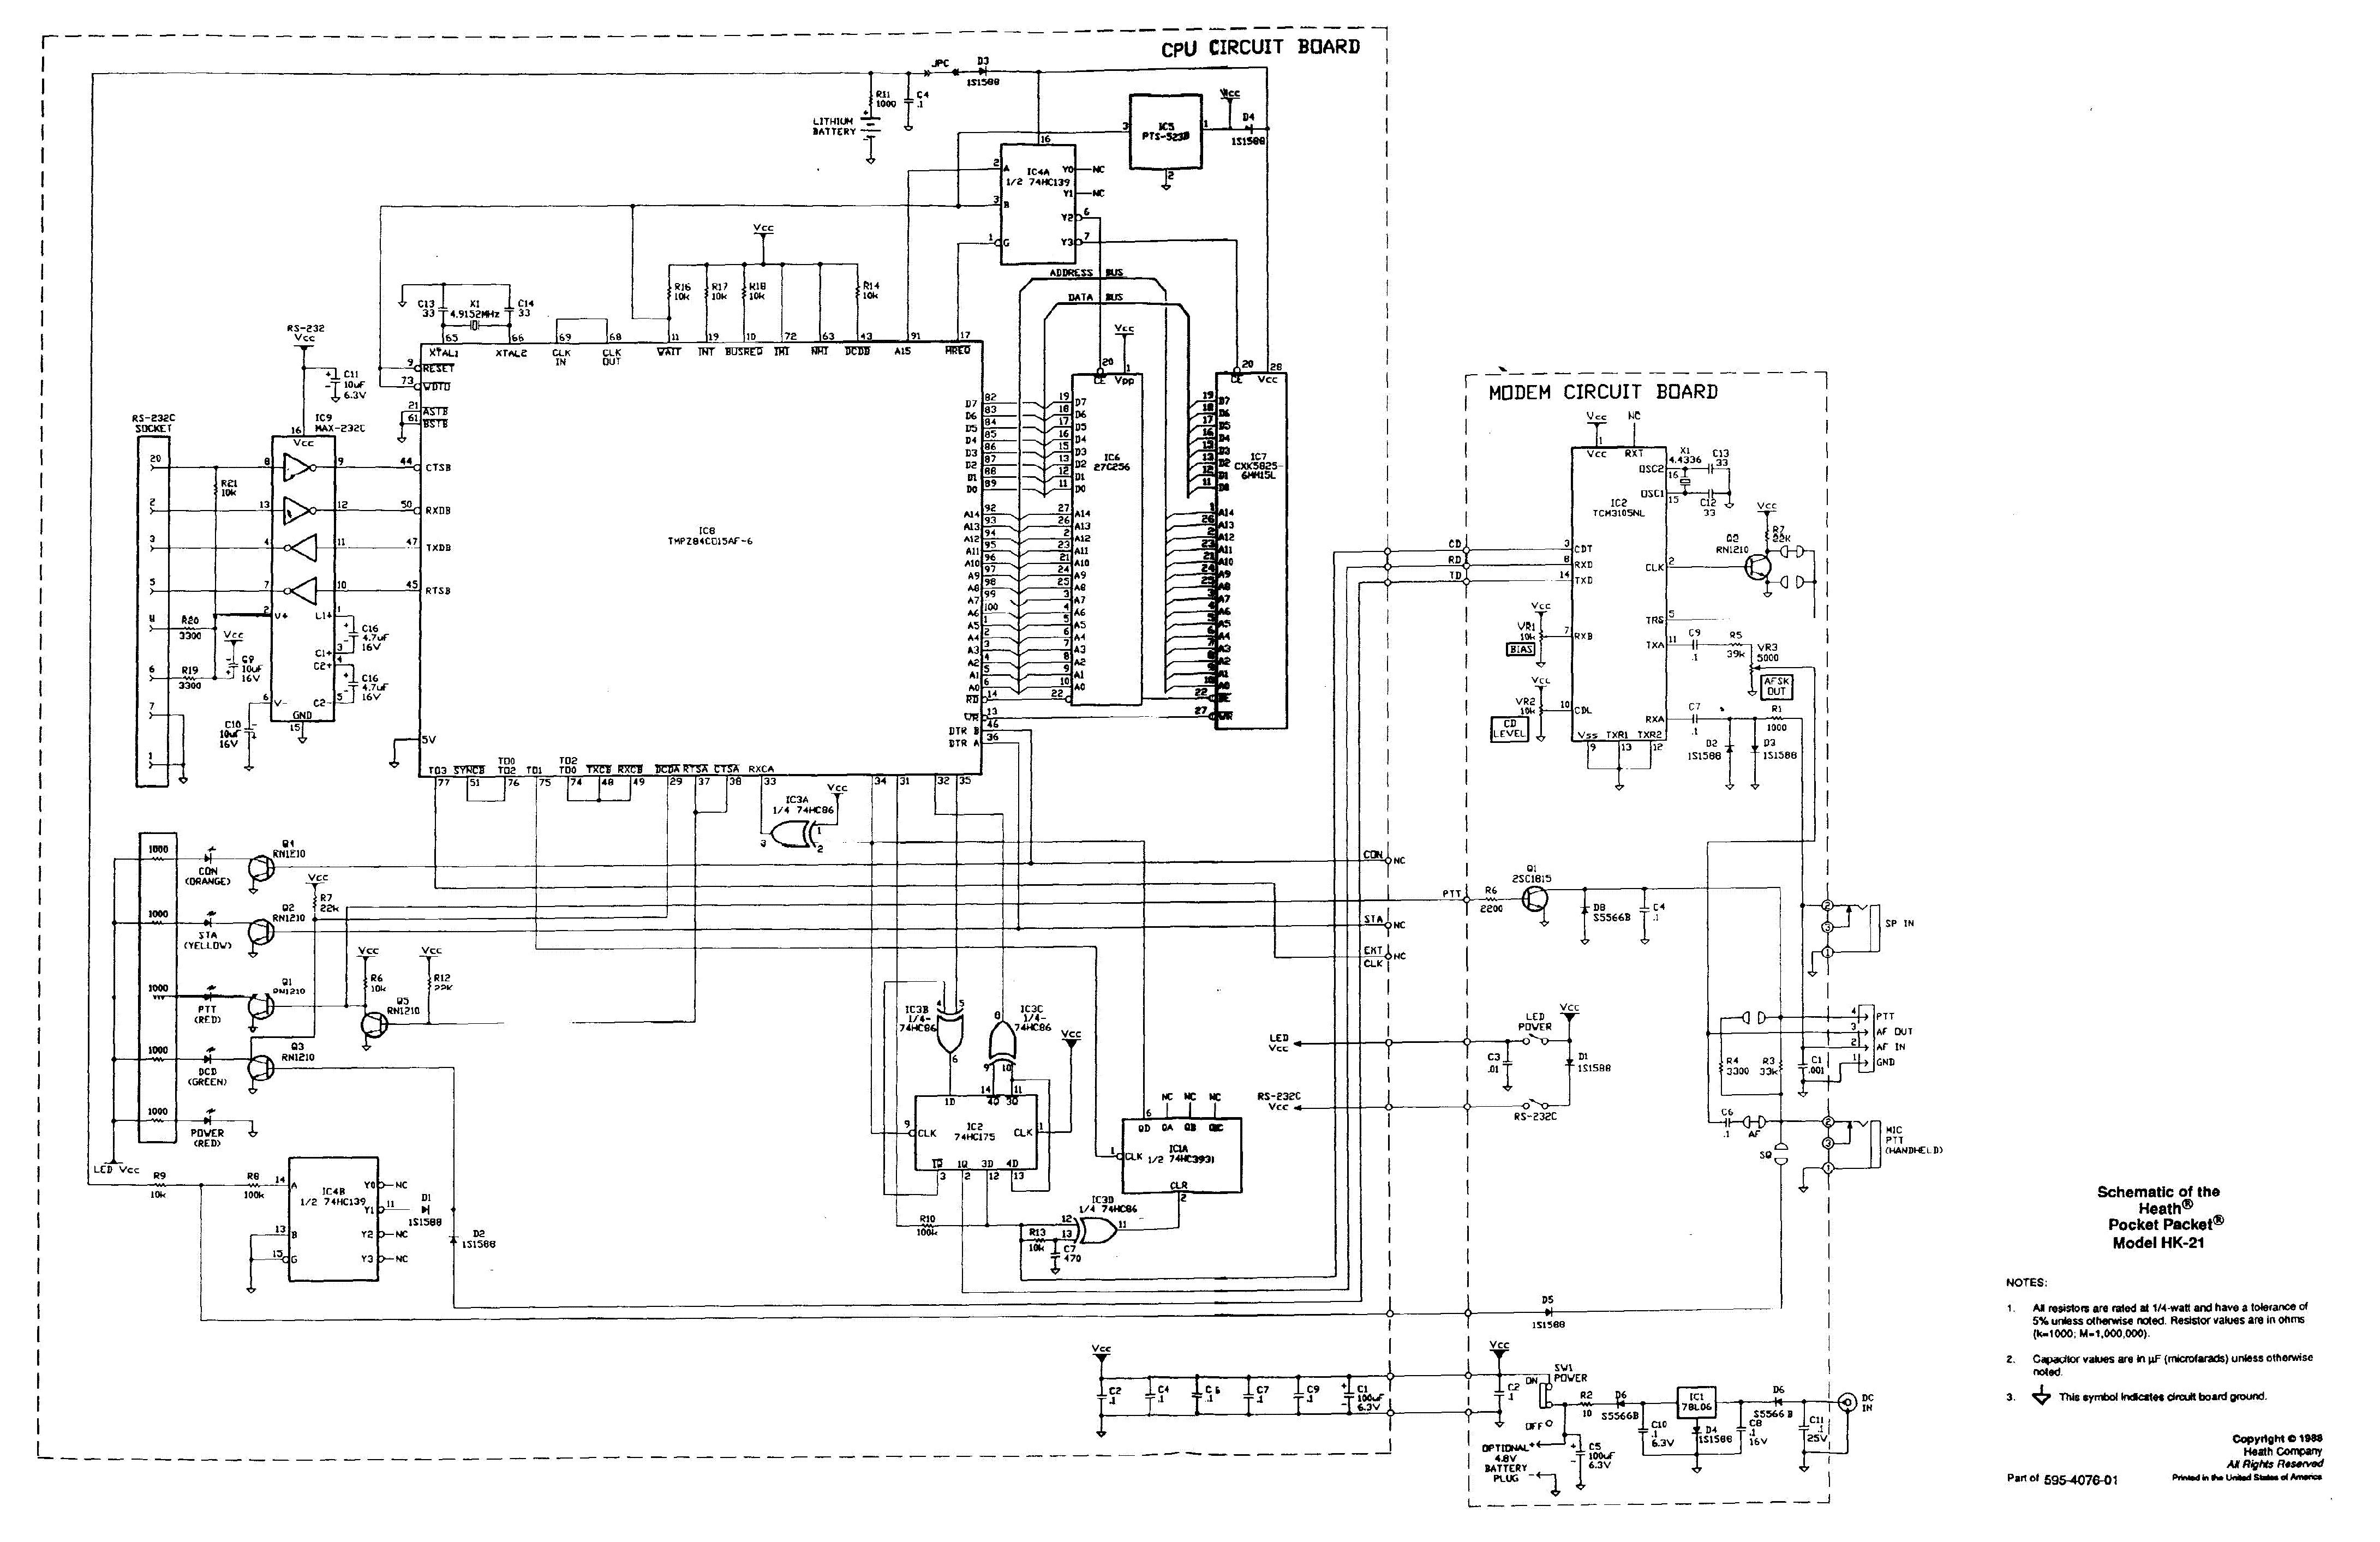 dx 40 schematic wiring diagram article review mix 1kva inverter circuit diagram manual new heathkit dx [ 4362 x 2827 Pixel ]